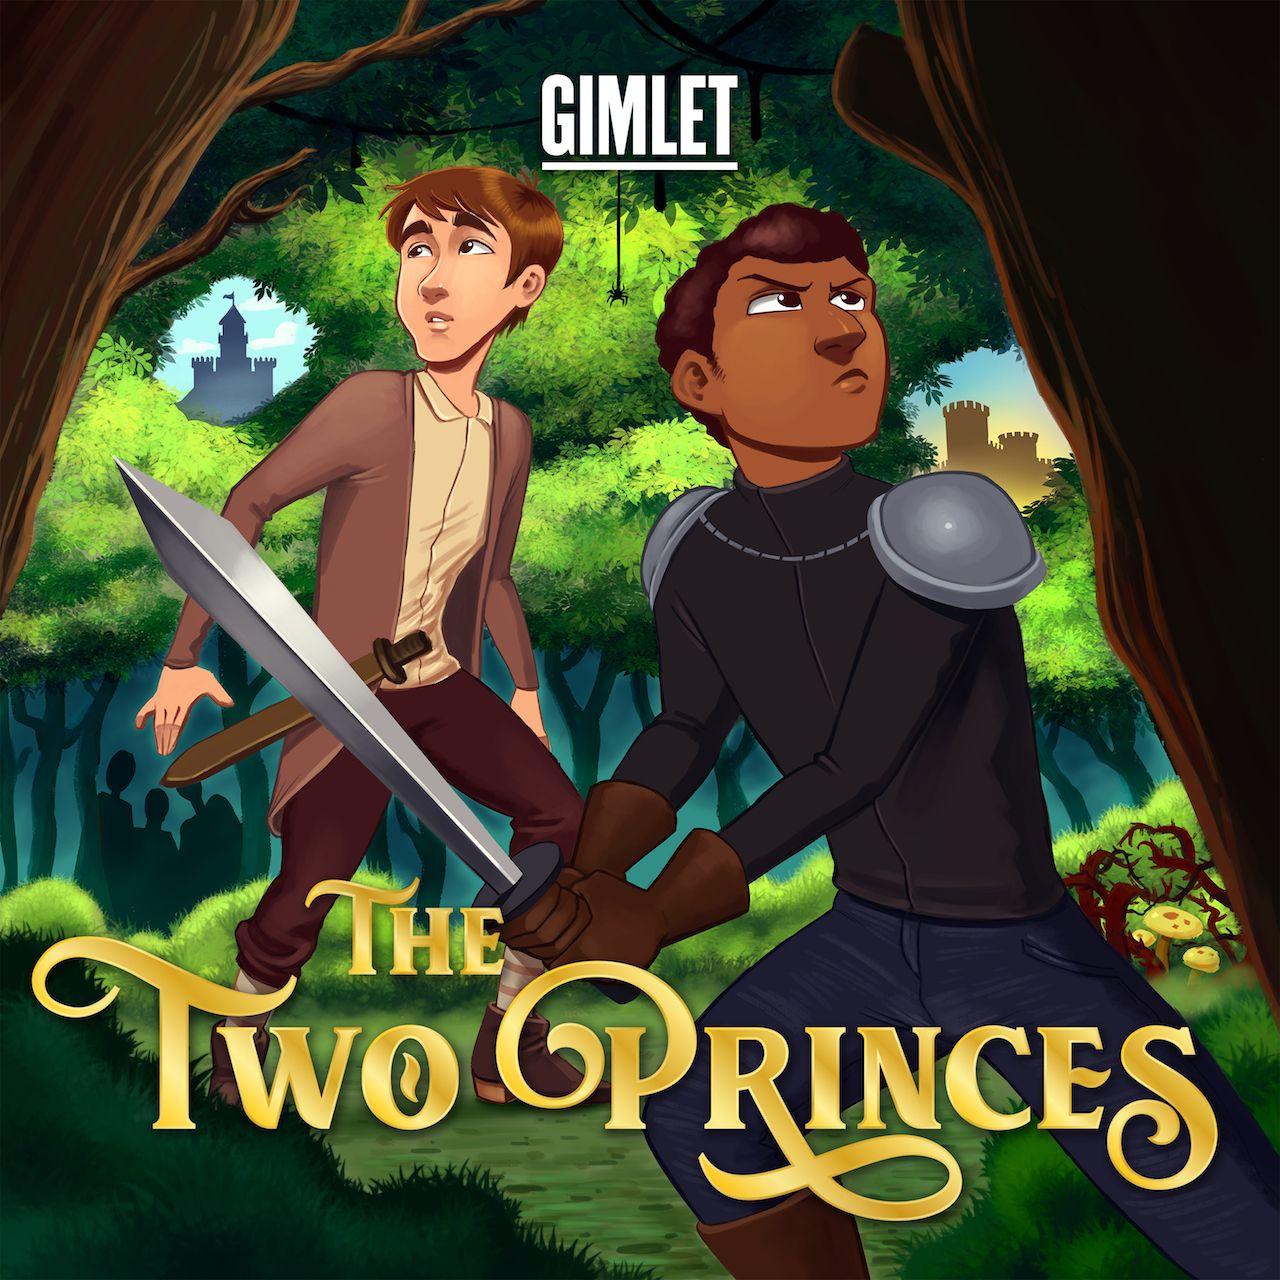 S1 Ep2: Prince and Thief